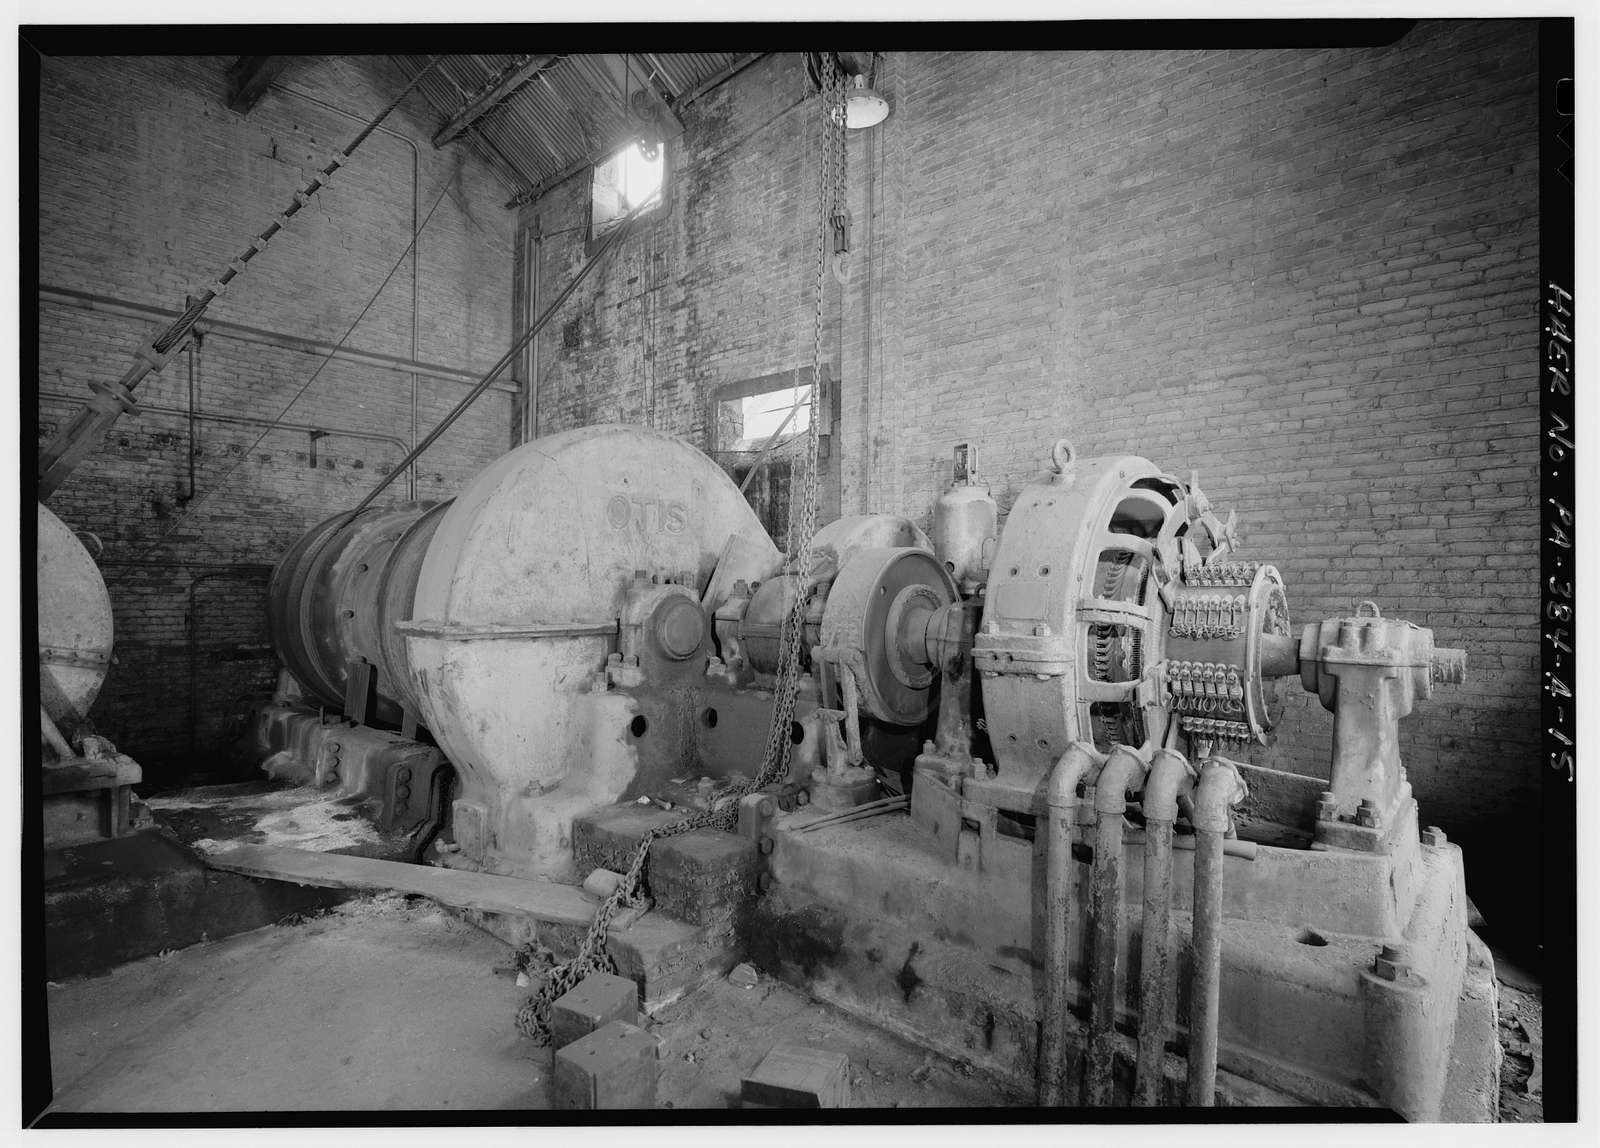 U.S. Steel Edgar Thomson Works, Blast Furnace Plant, Along Monongahela River, Braddock, Allegheny County, PA